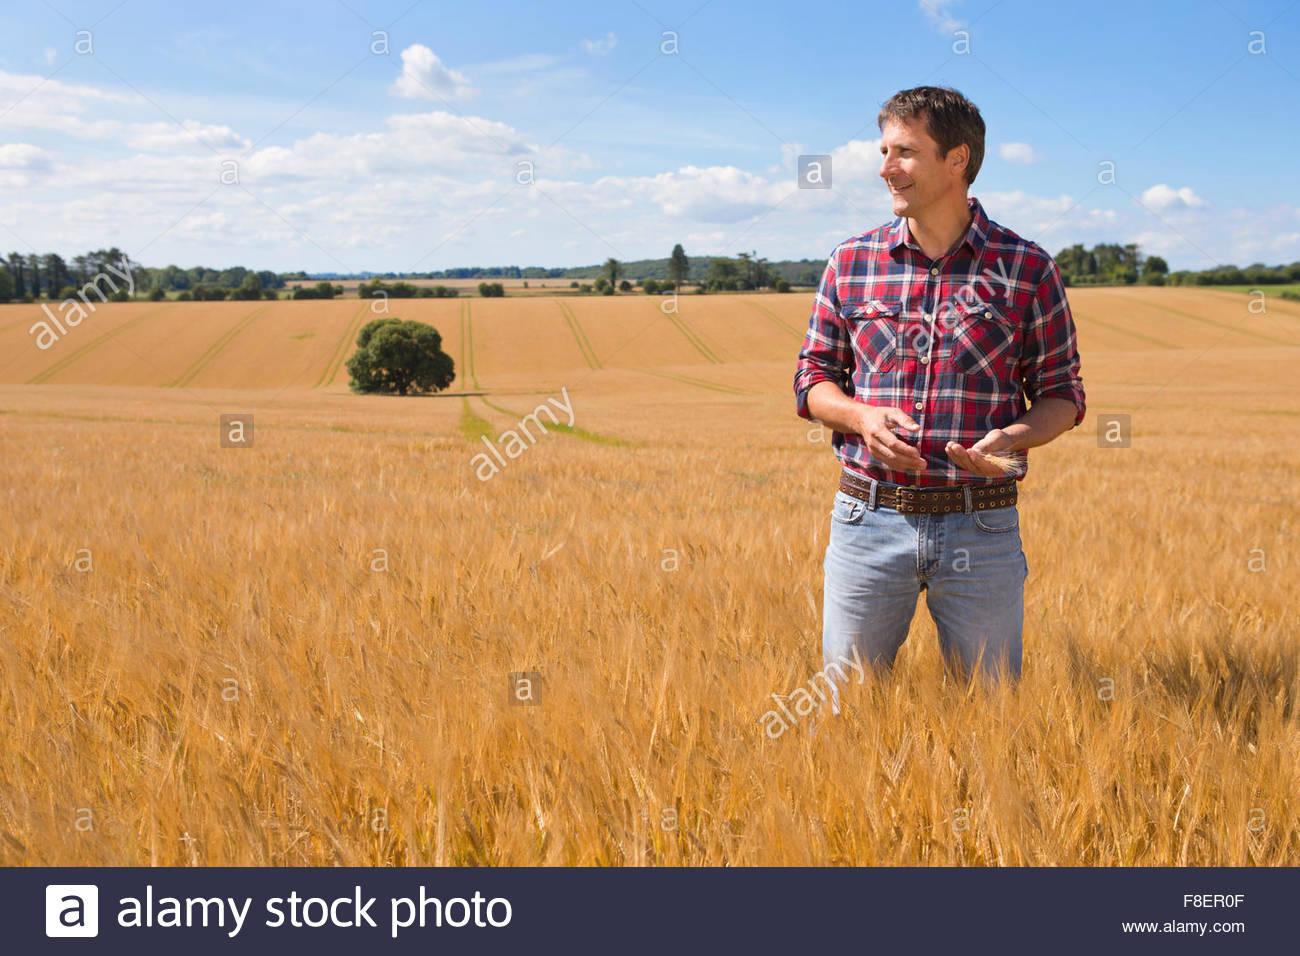 Farmer looking away in sunny rural barley crop field in summer - Stock Image